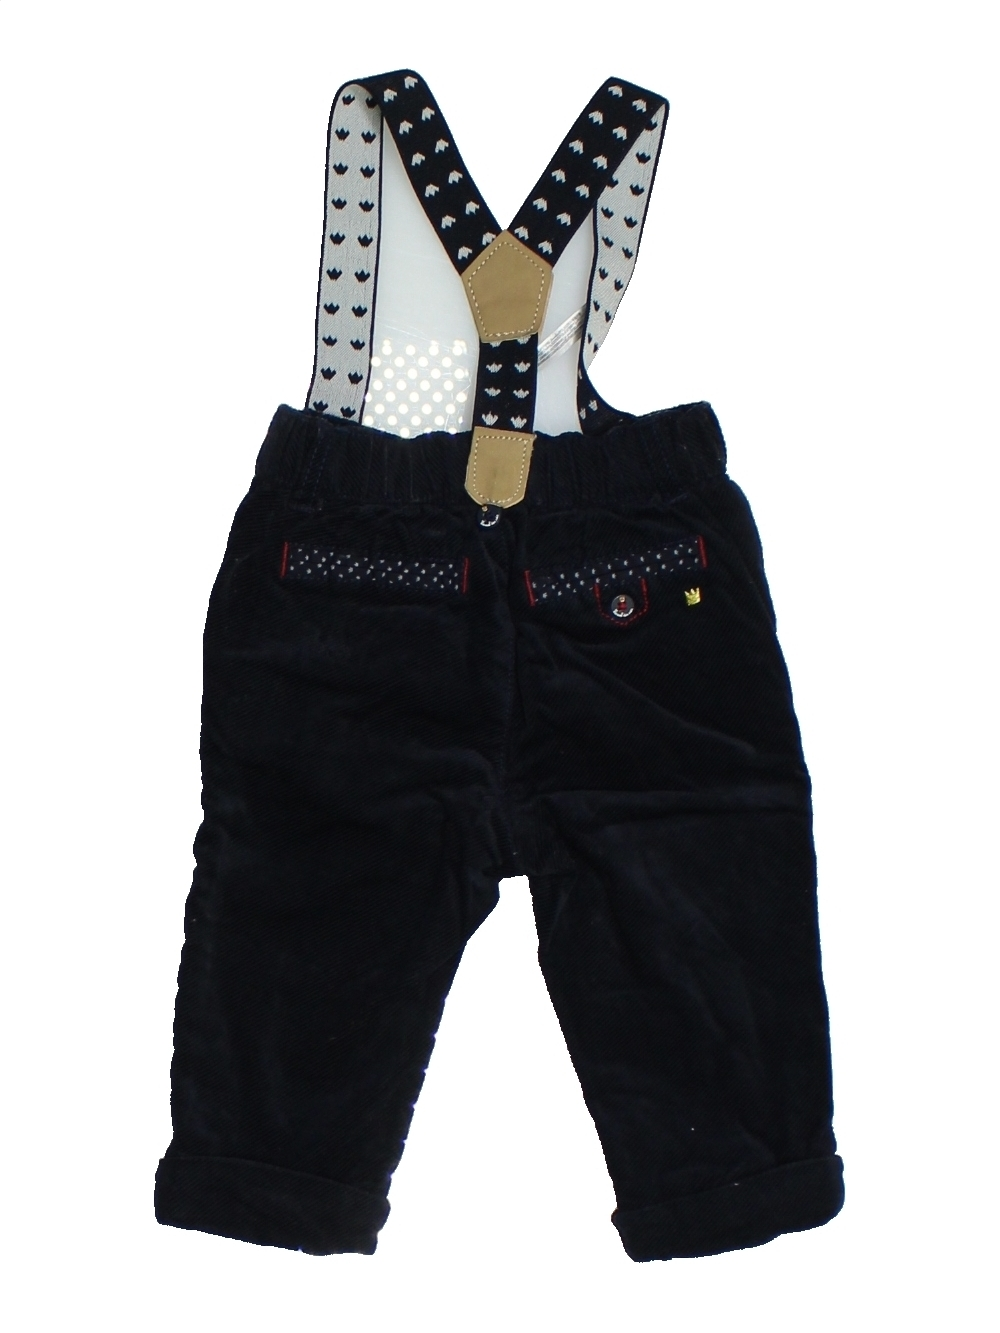 Pantalon-bebe-garcon-SERGENT-MAJOR-6-mois-noir-hiver-vetement-bebe-1099